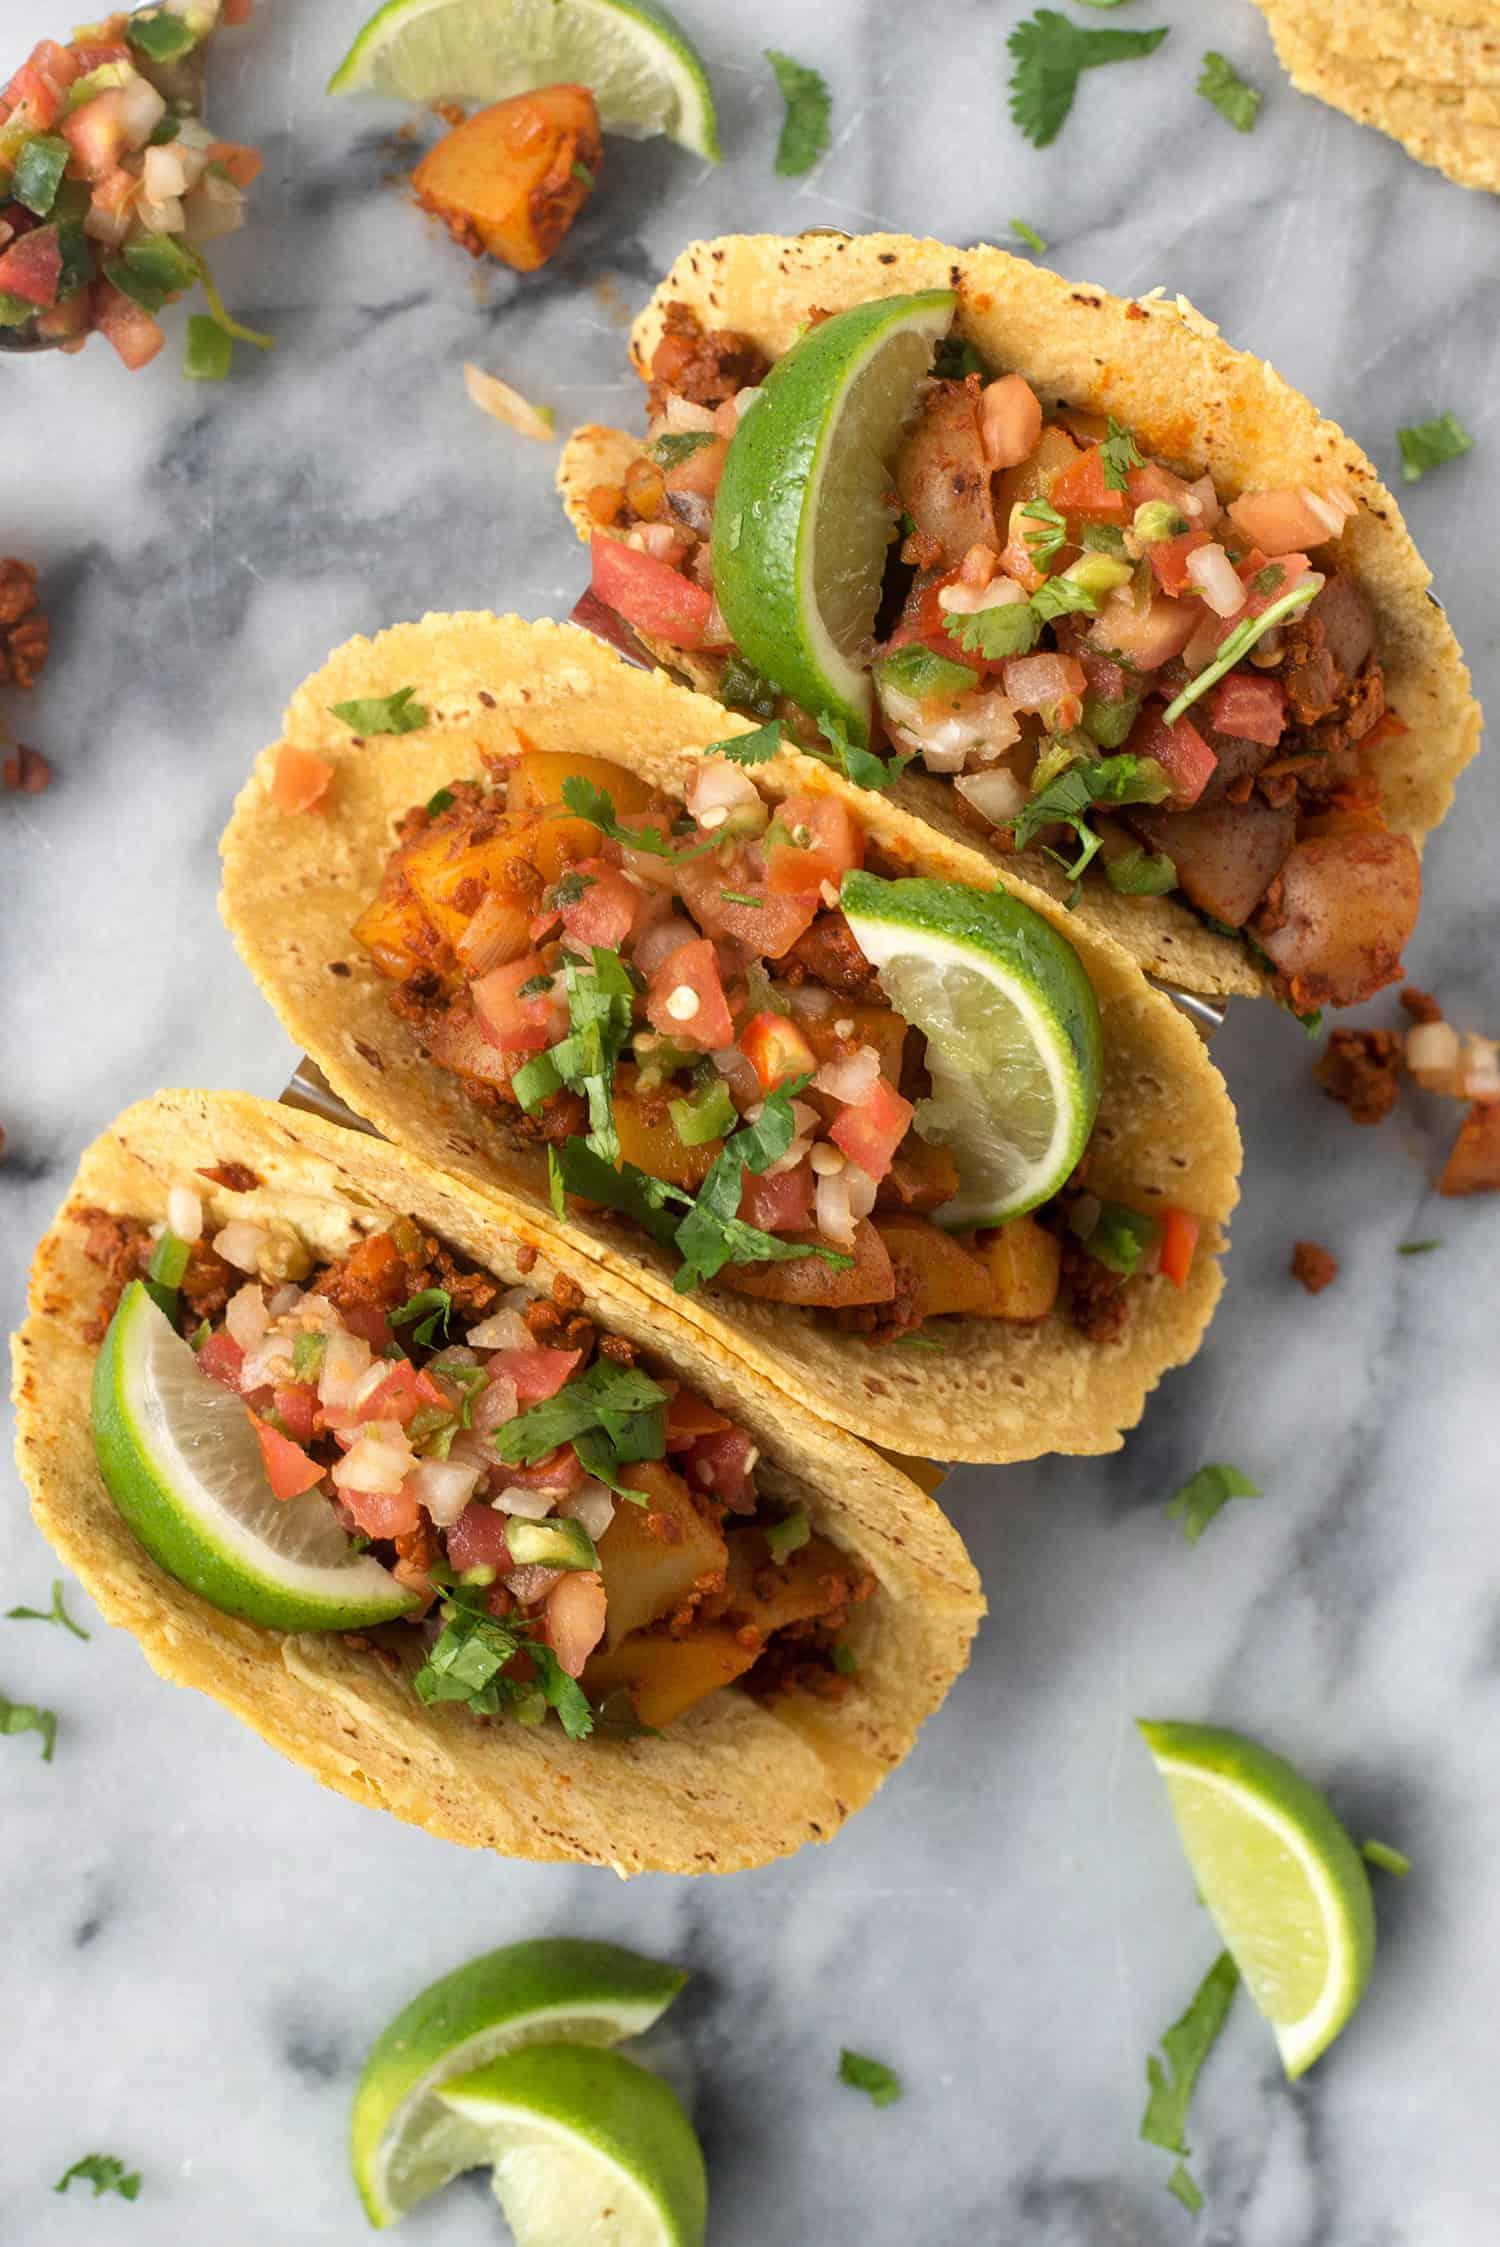 vegan soyrizo and potato tacos with pico de gallo